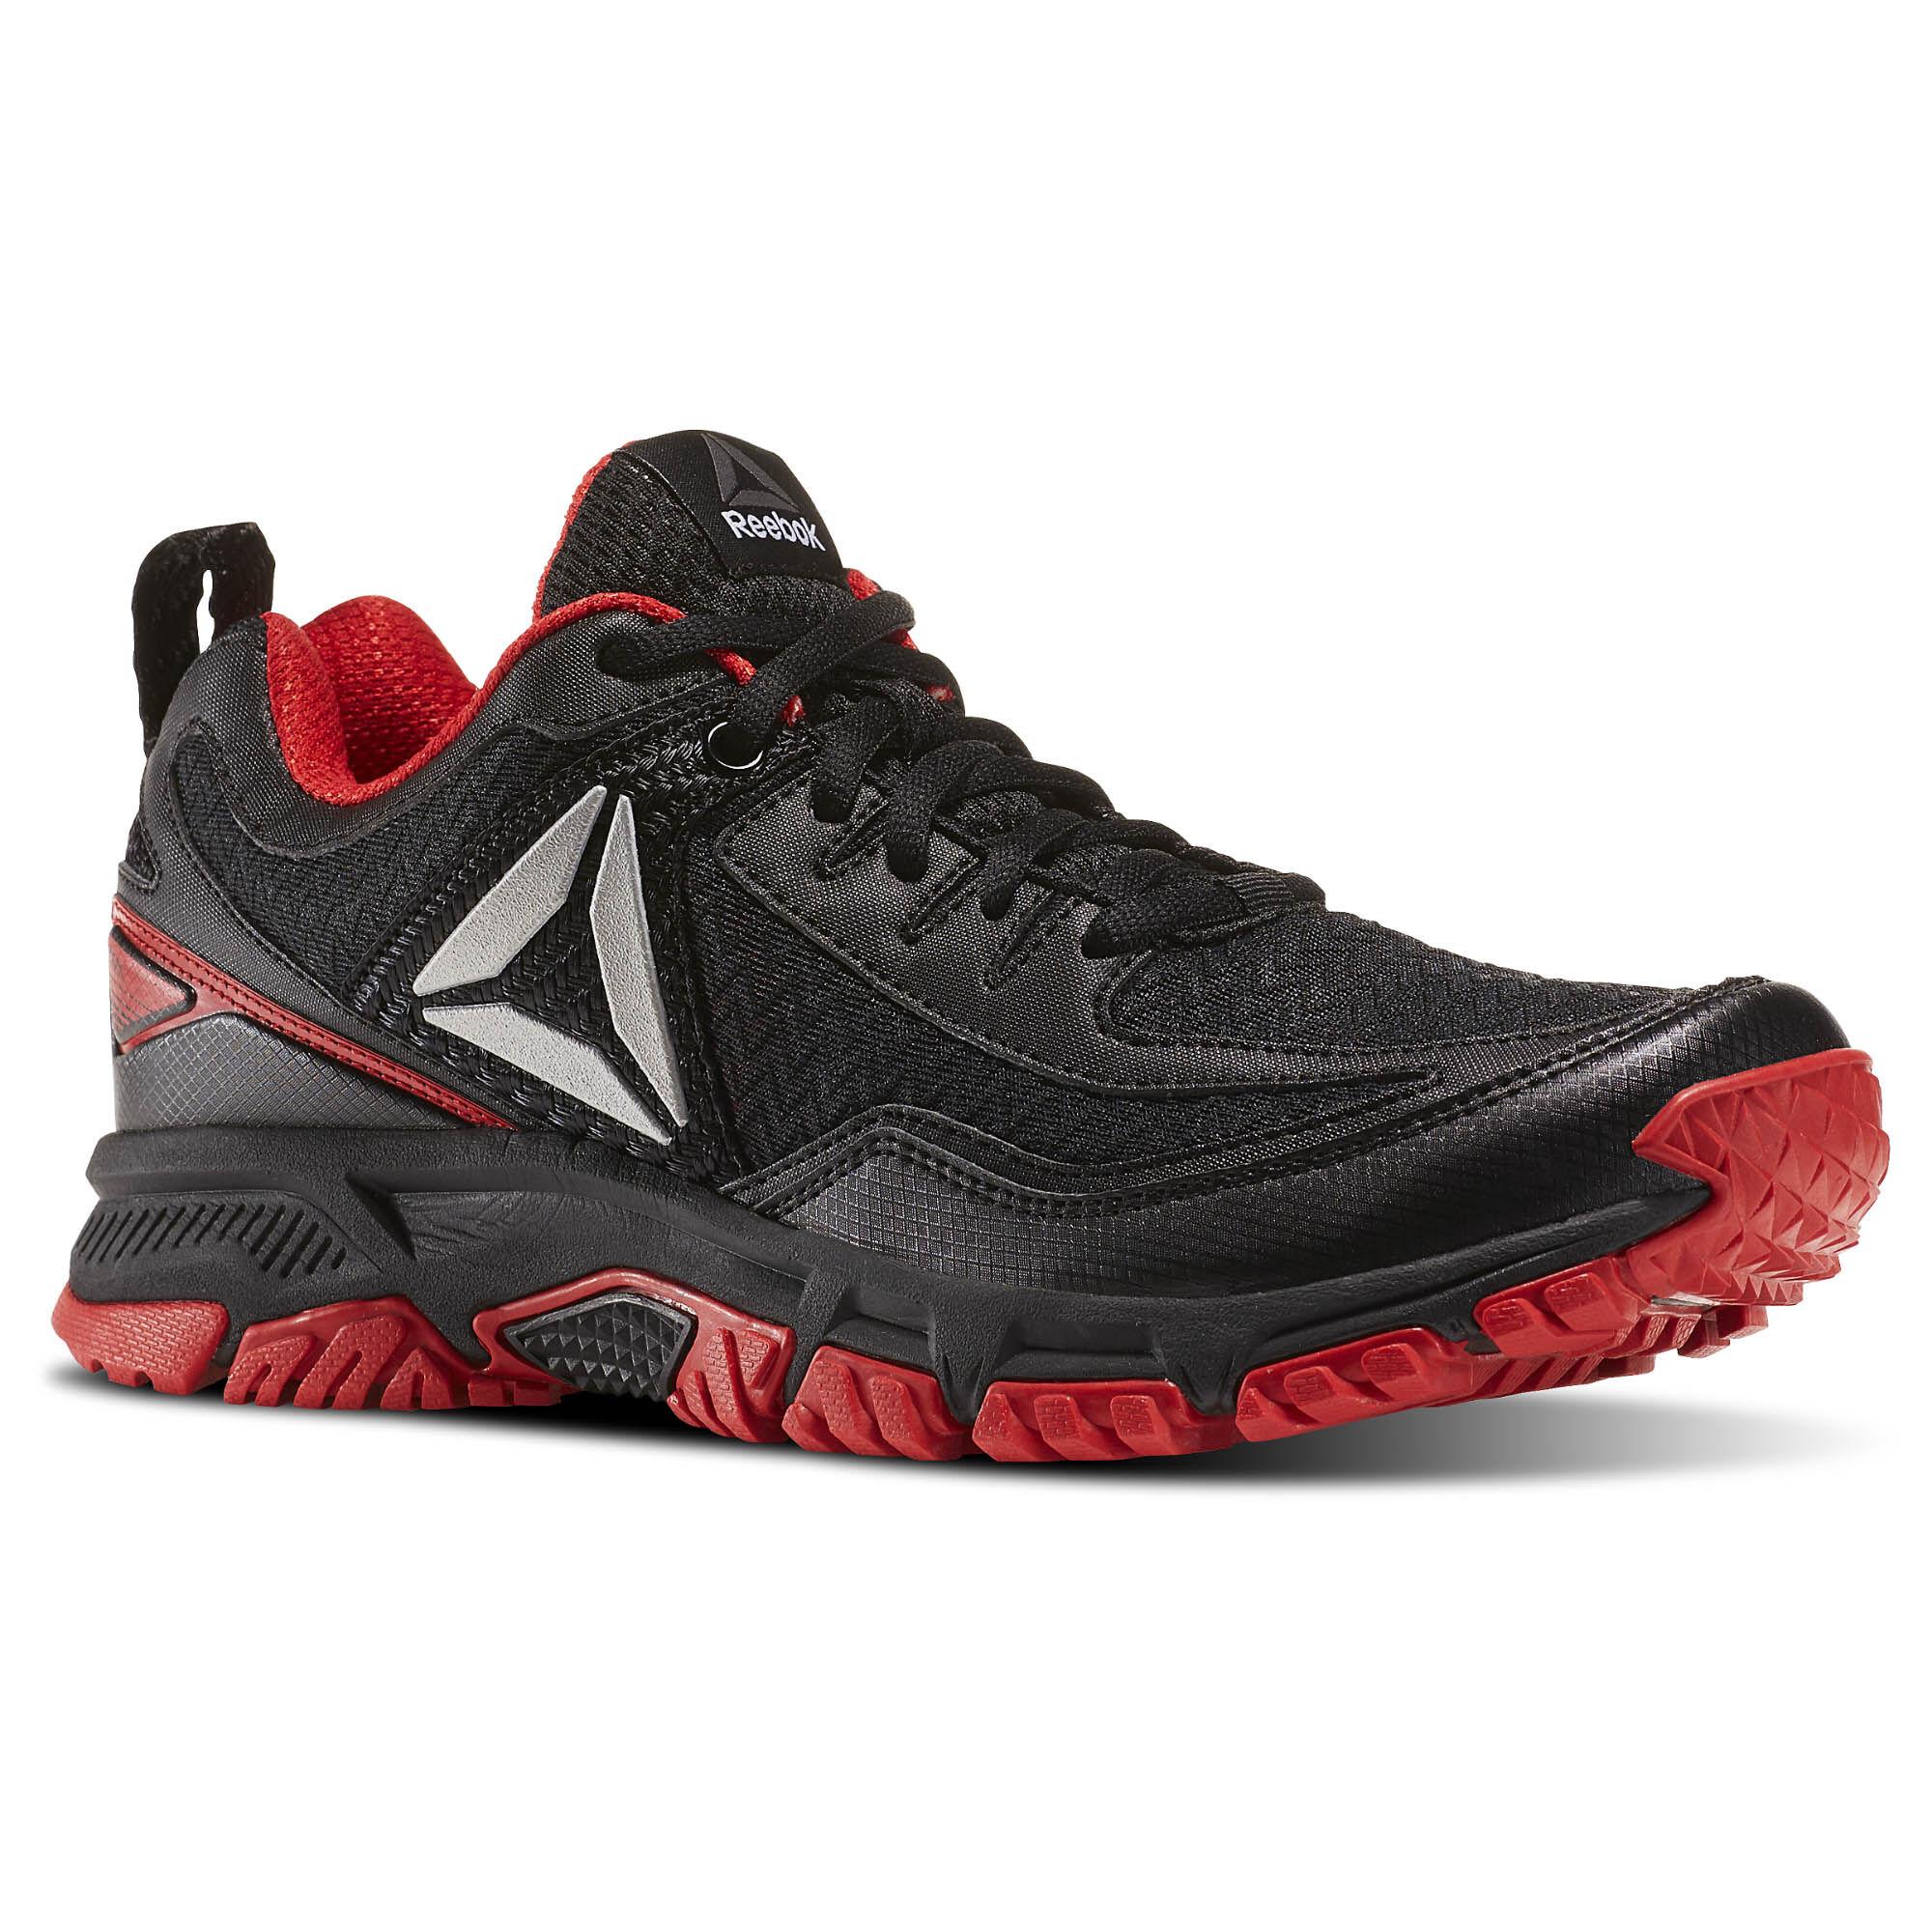 Reebok - Ridgerider Trail 2.0 Black/Primal Red/Silver BD2246